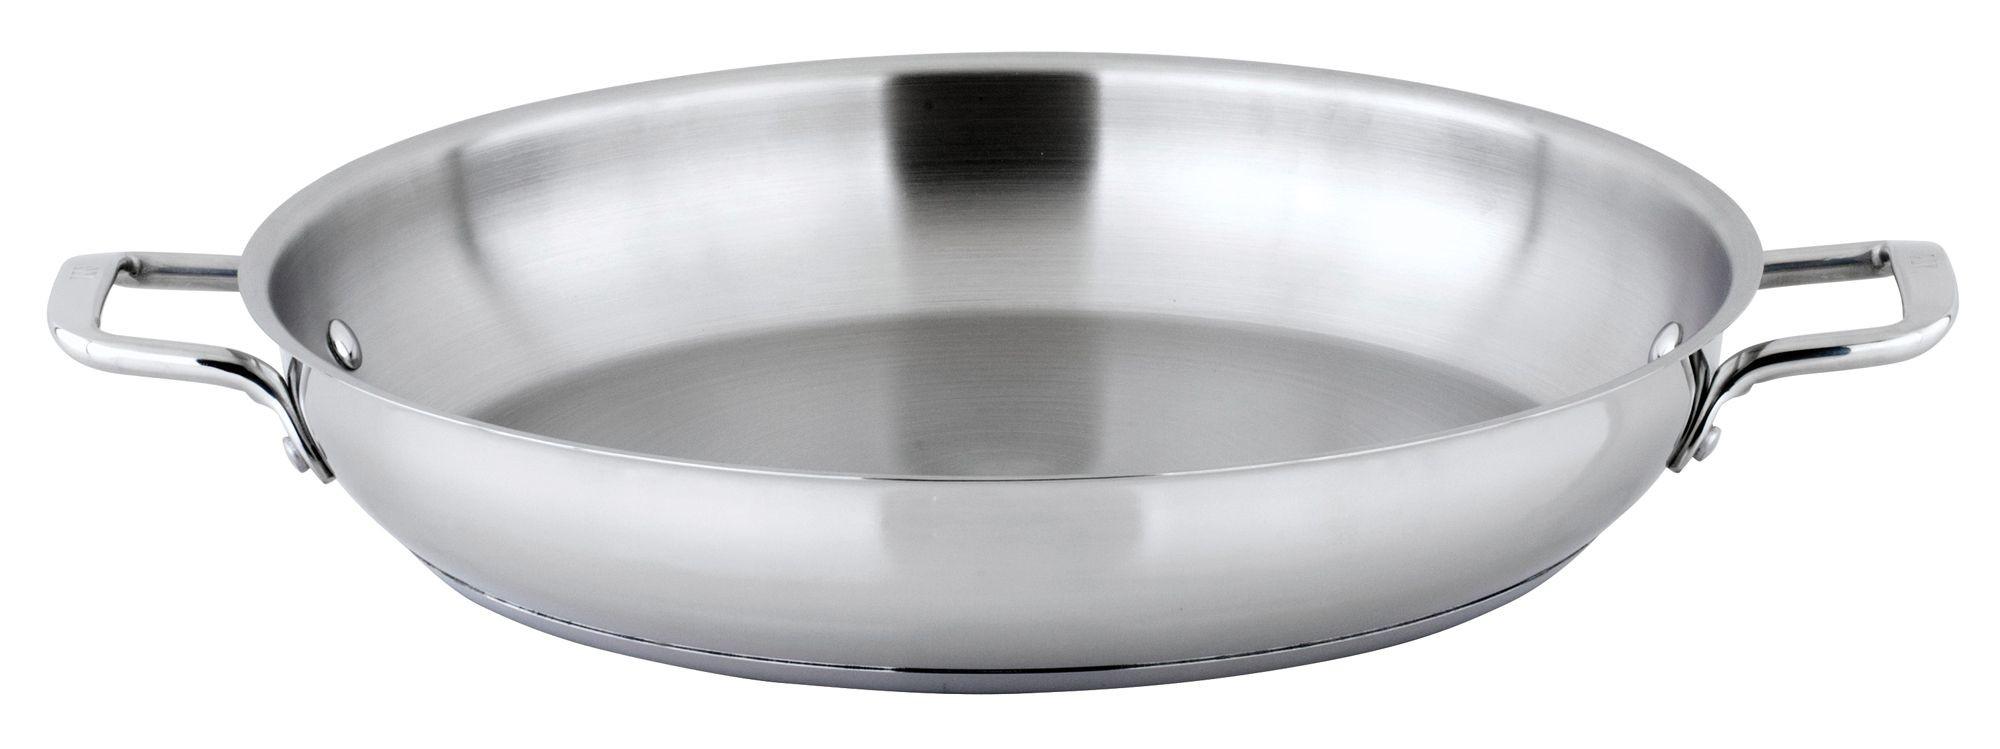 "Winco SSOP-14 Stainless Steel 14"" Omelet Pan"